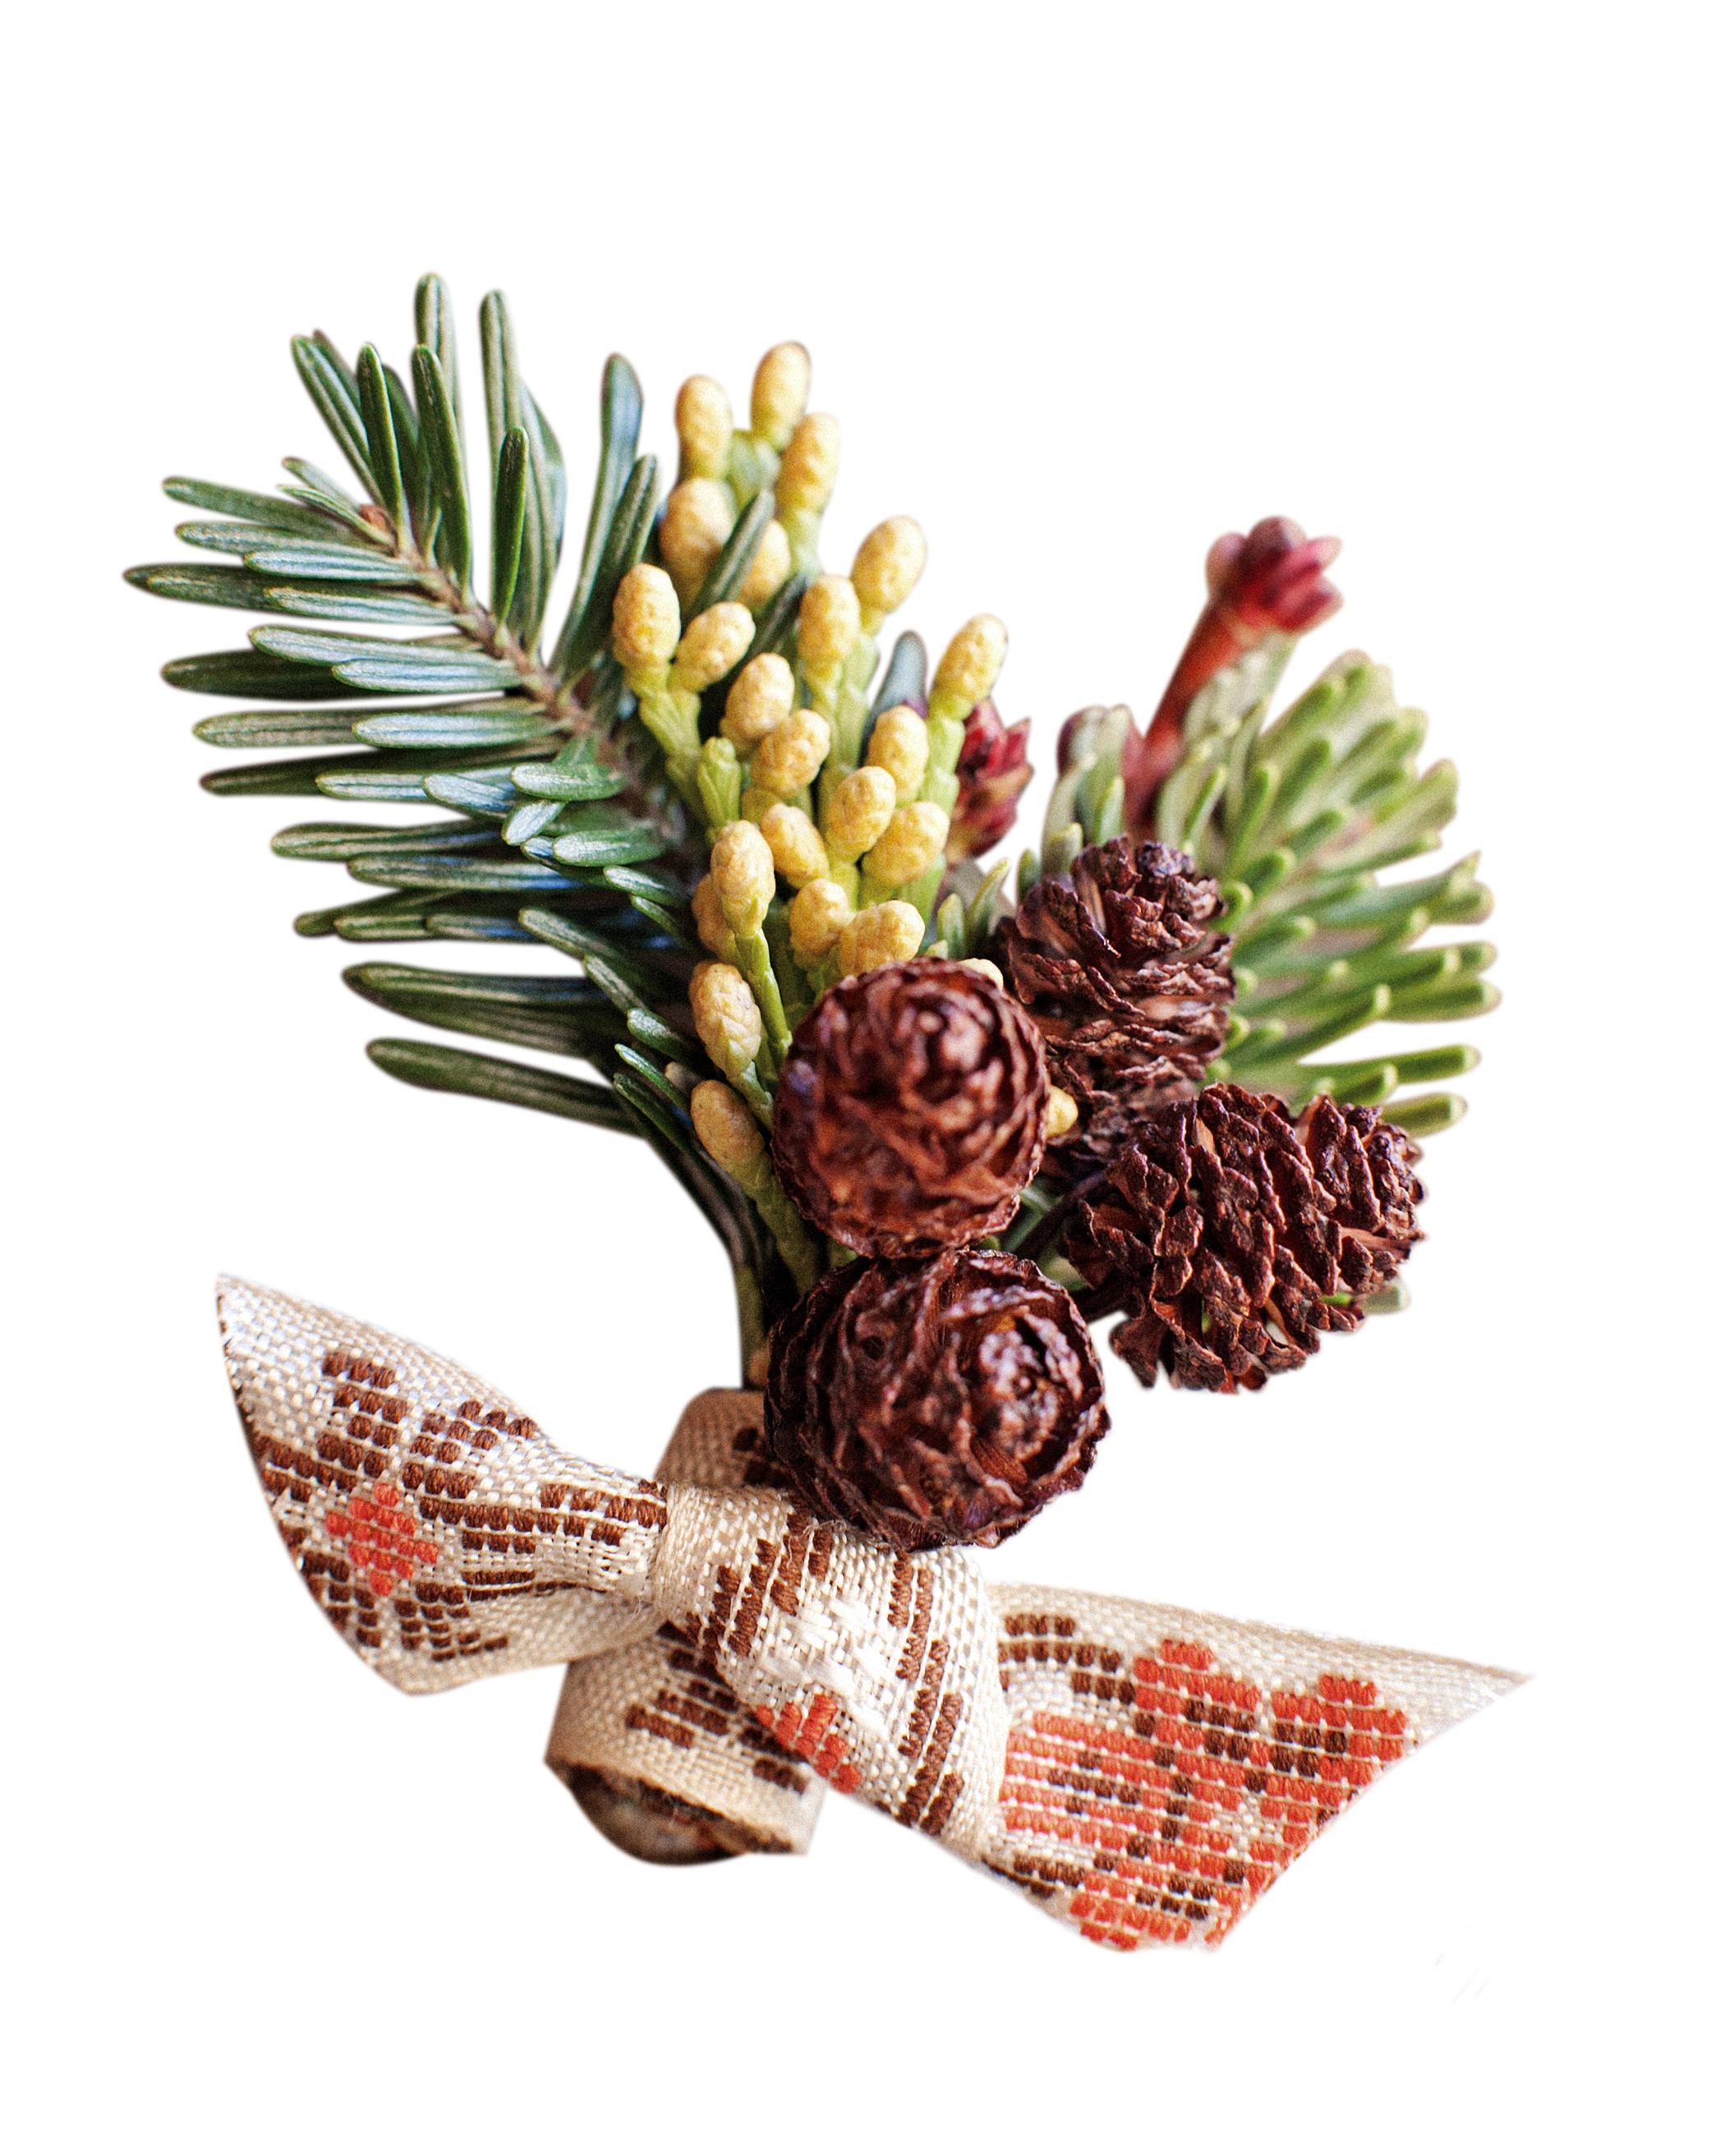 pinecones-0811mwds106661.jpg